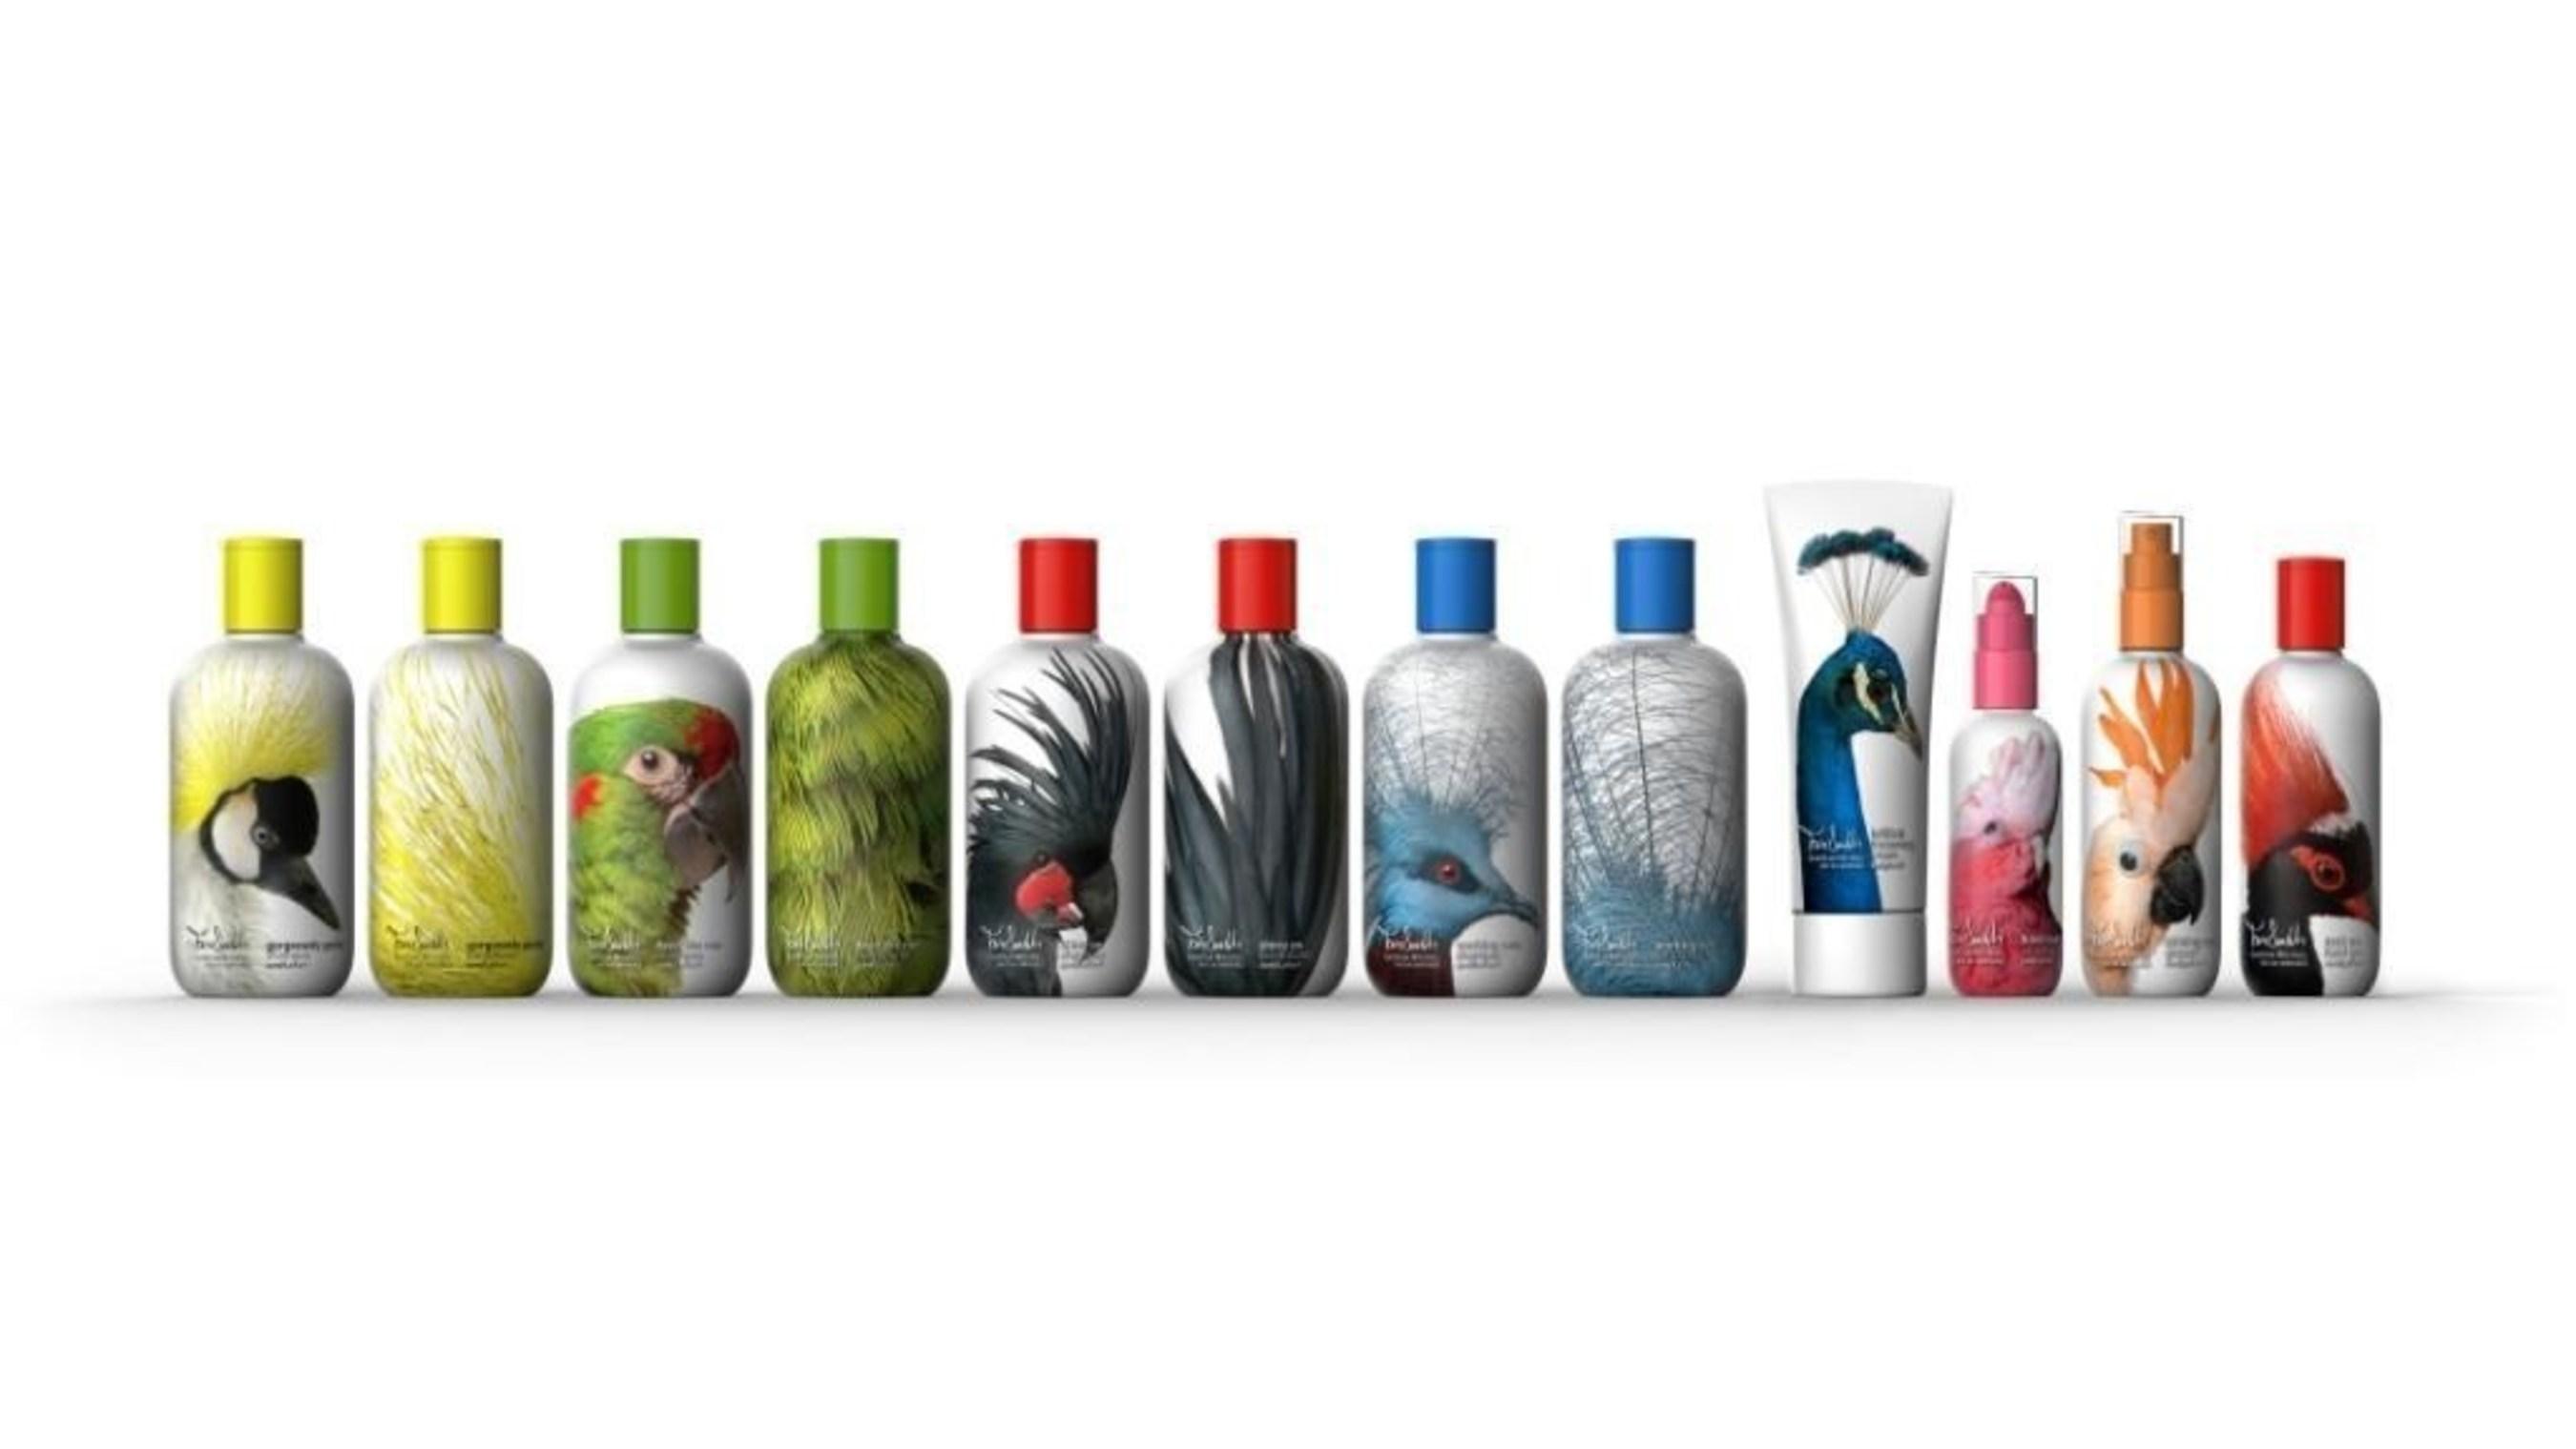 Tara Smith Haircare product range